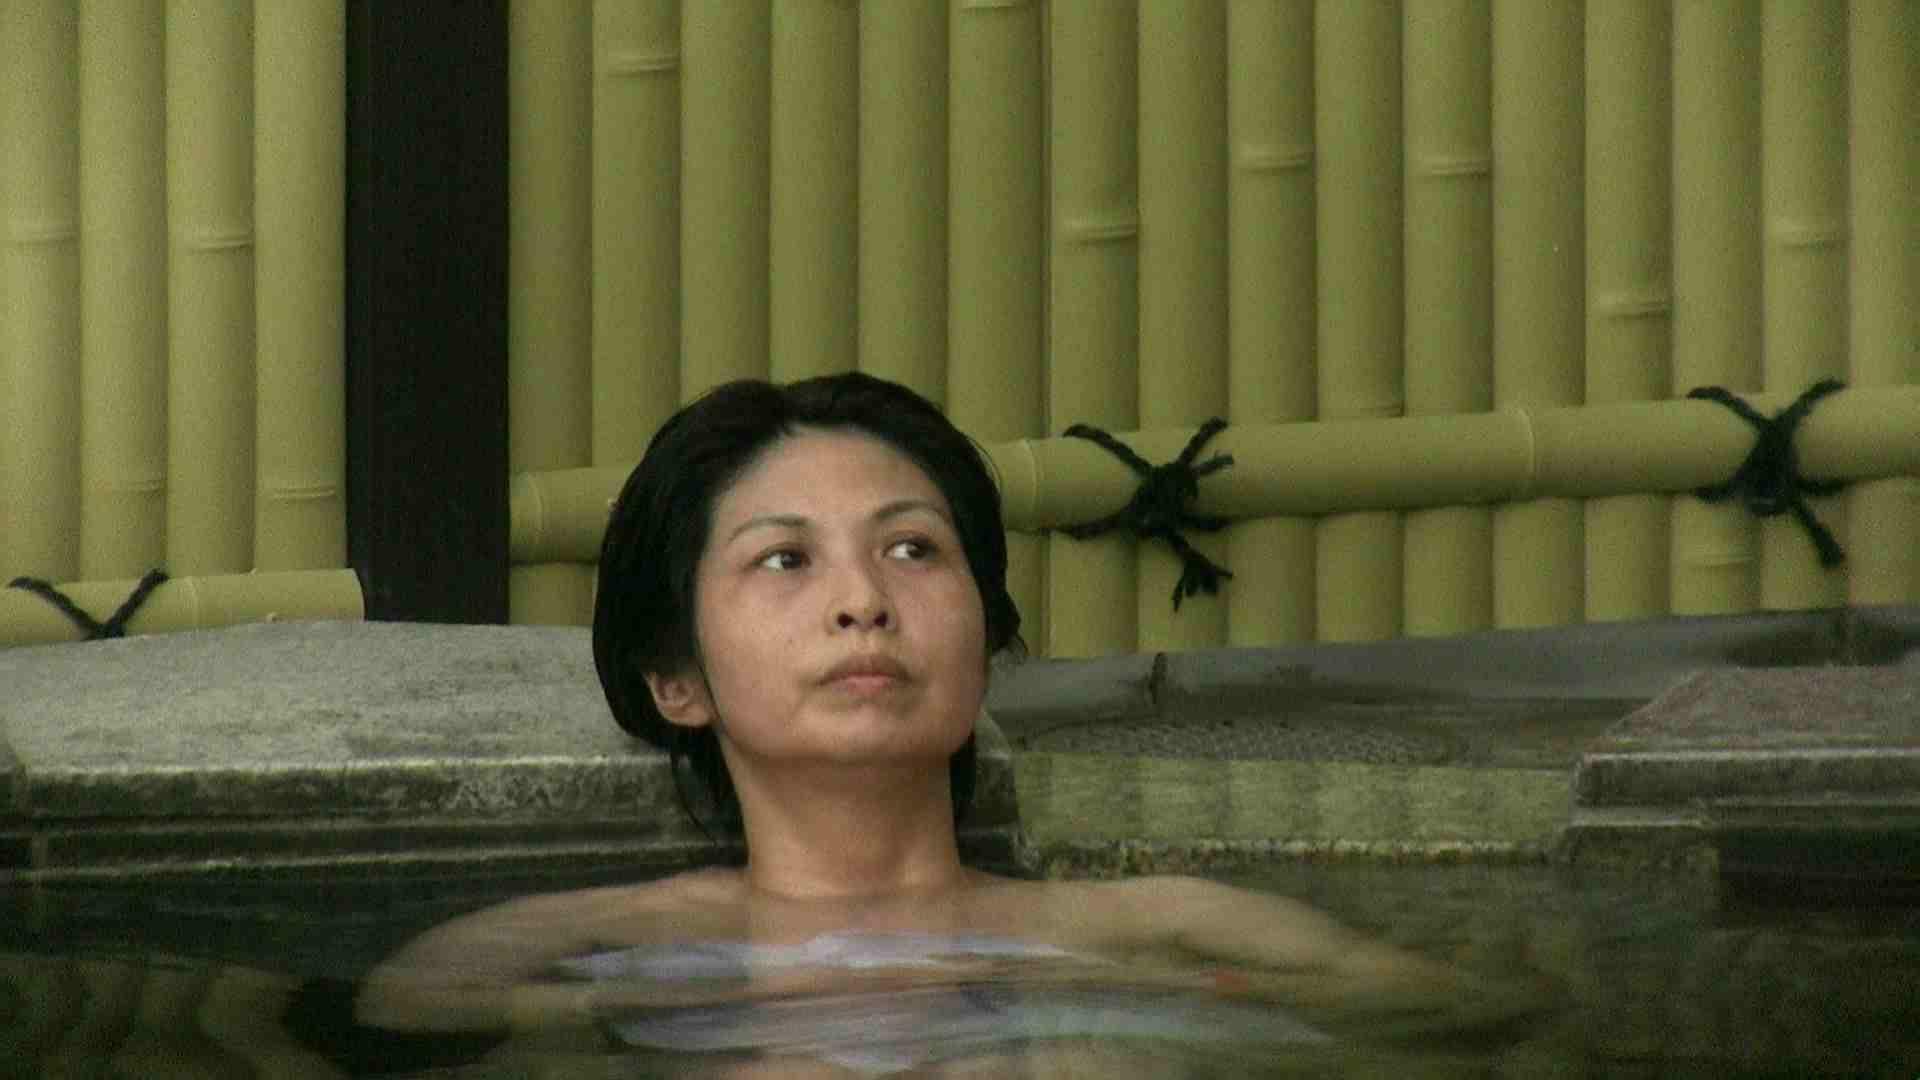 Aquaな露天風呂Vol.636 0  45連発 14